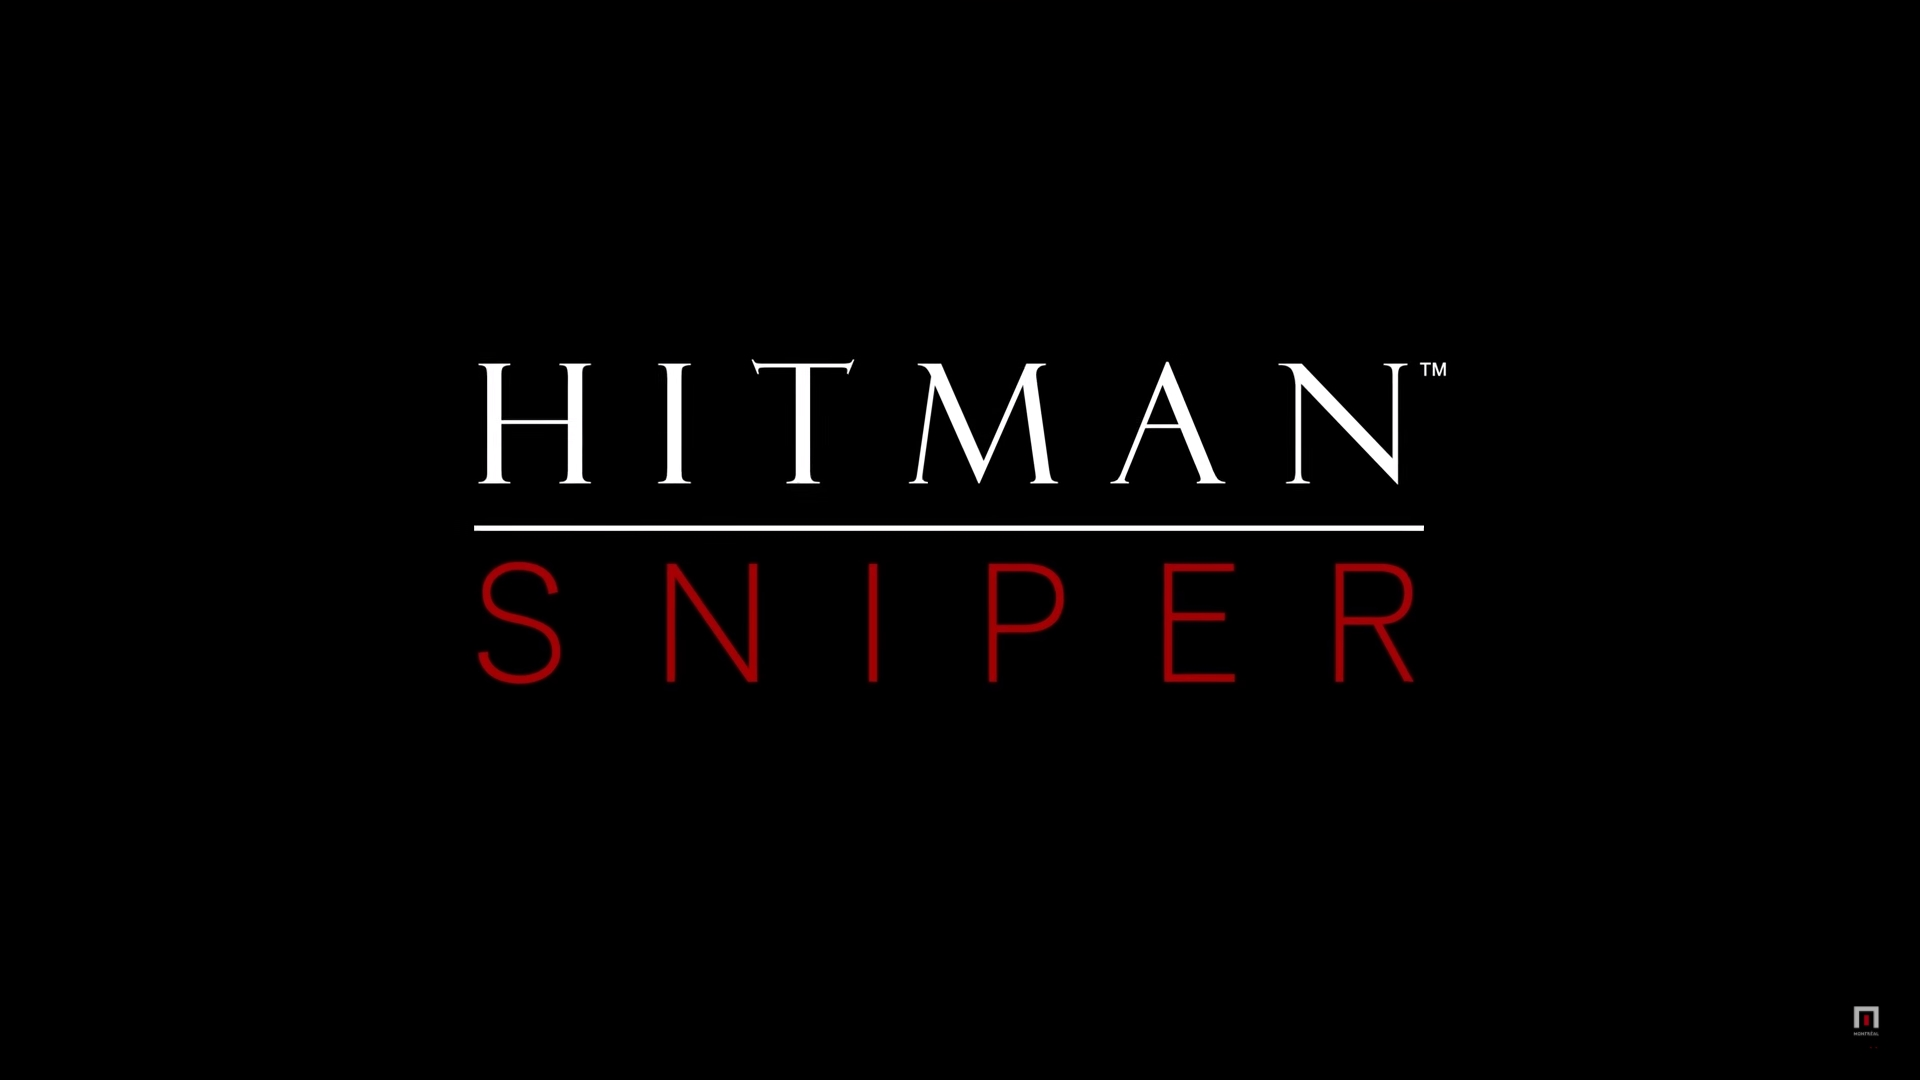 hitman sniper 14112017 04